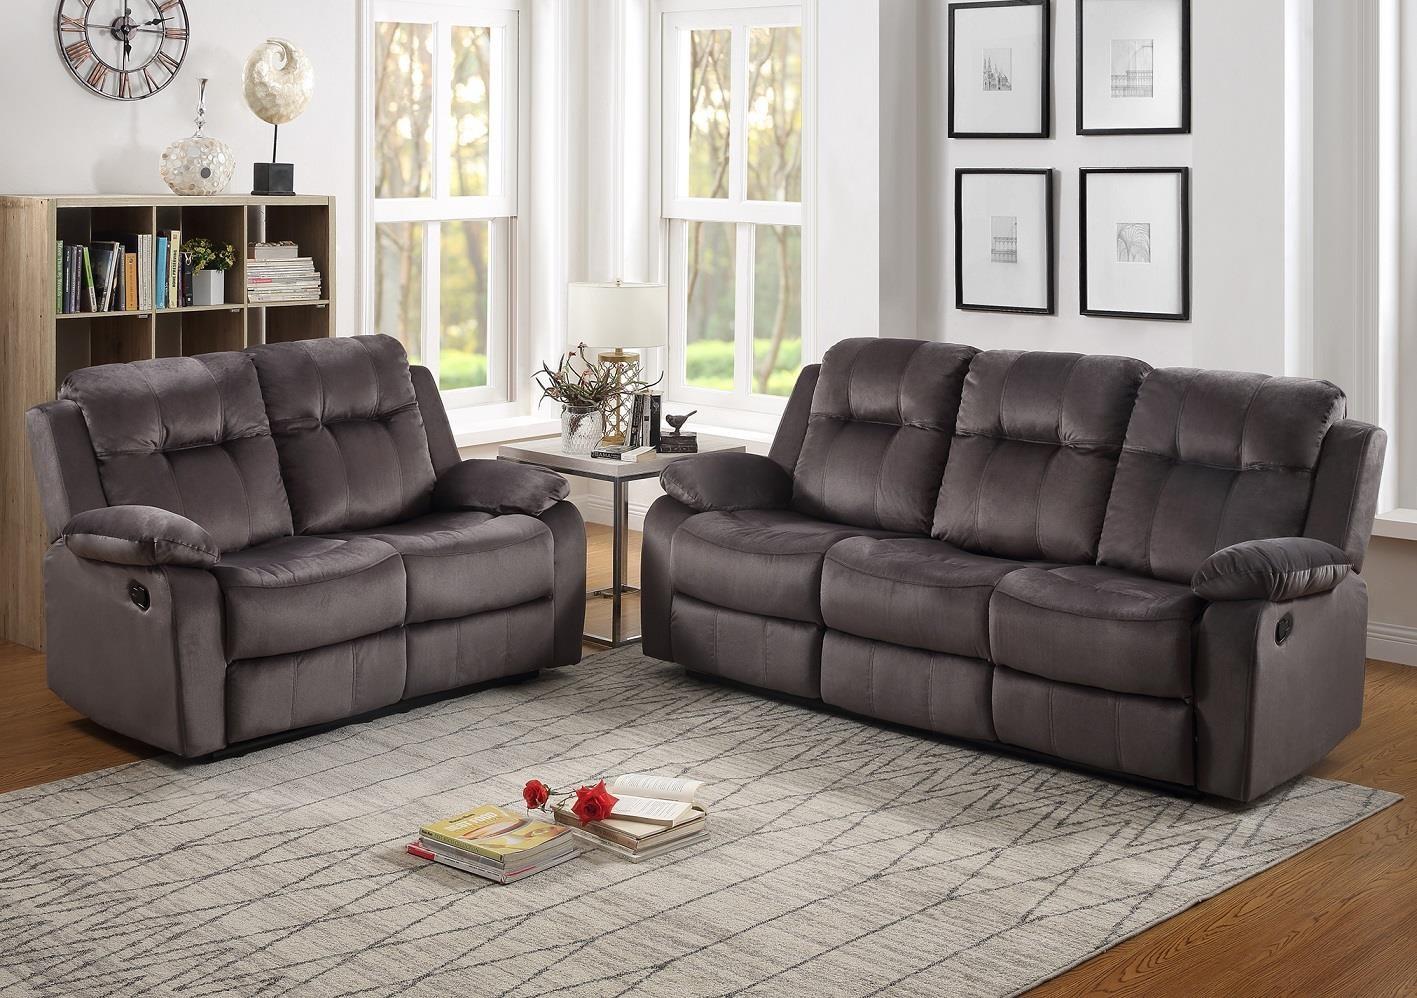 Fabulous Urbino Storm Grey Reclining Sofa Loveseat Set By Lifestyle At Sam Levitz Furniture Interior Design Ideas Gentotthenellocom